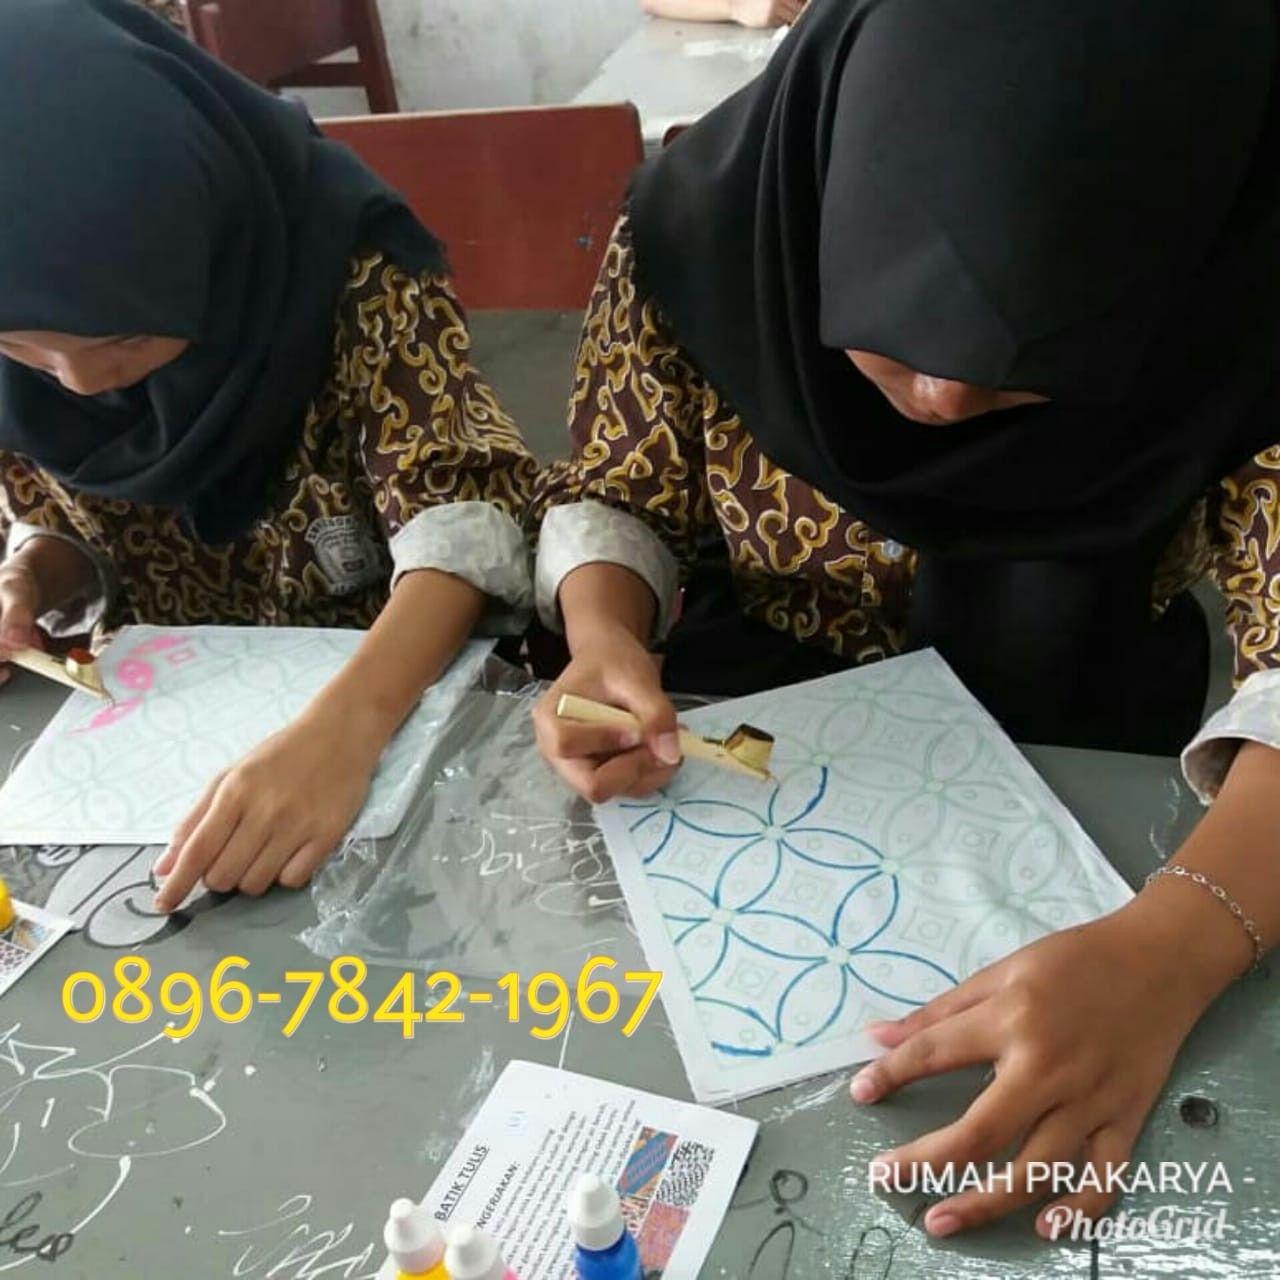 Jual Alat Batik Jakarta Barat